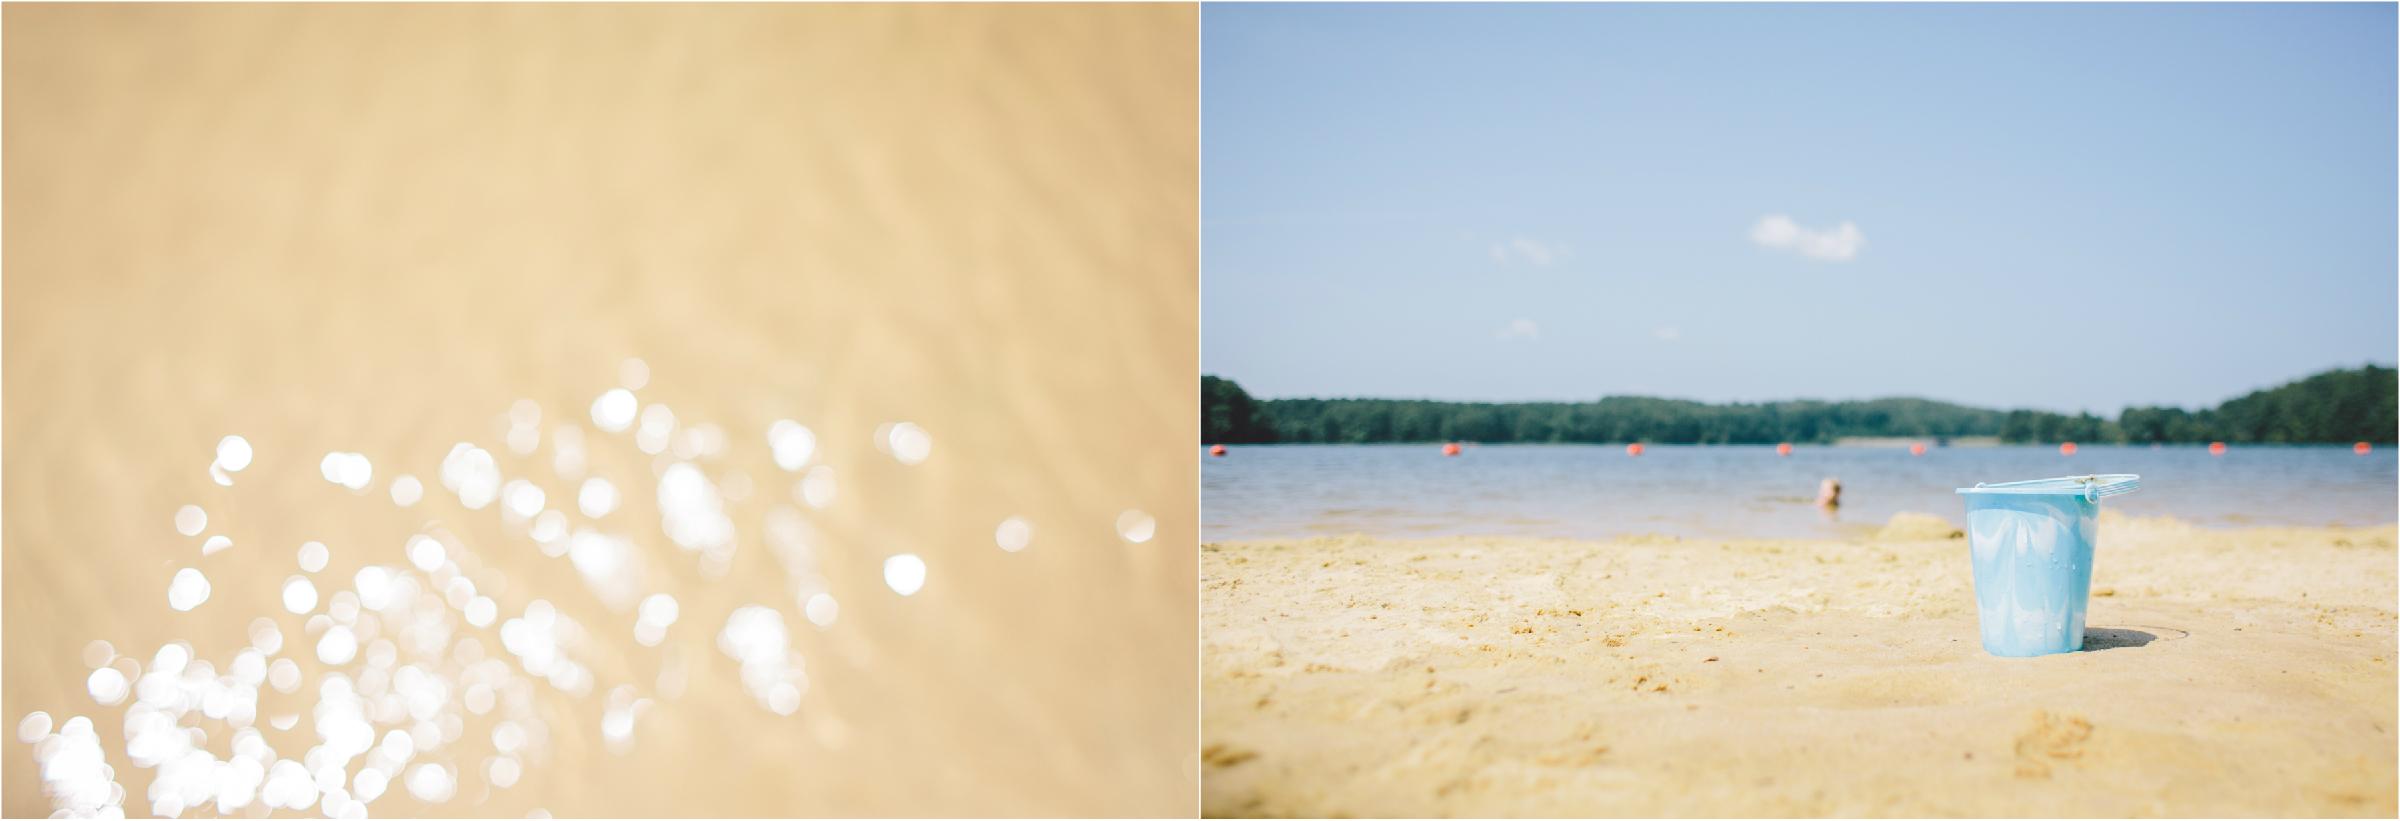 acworth beach, ga